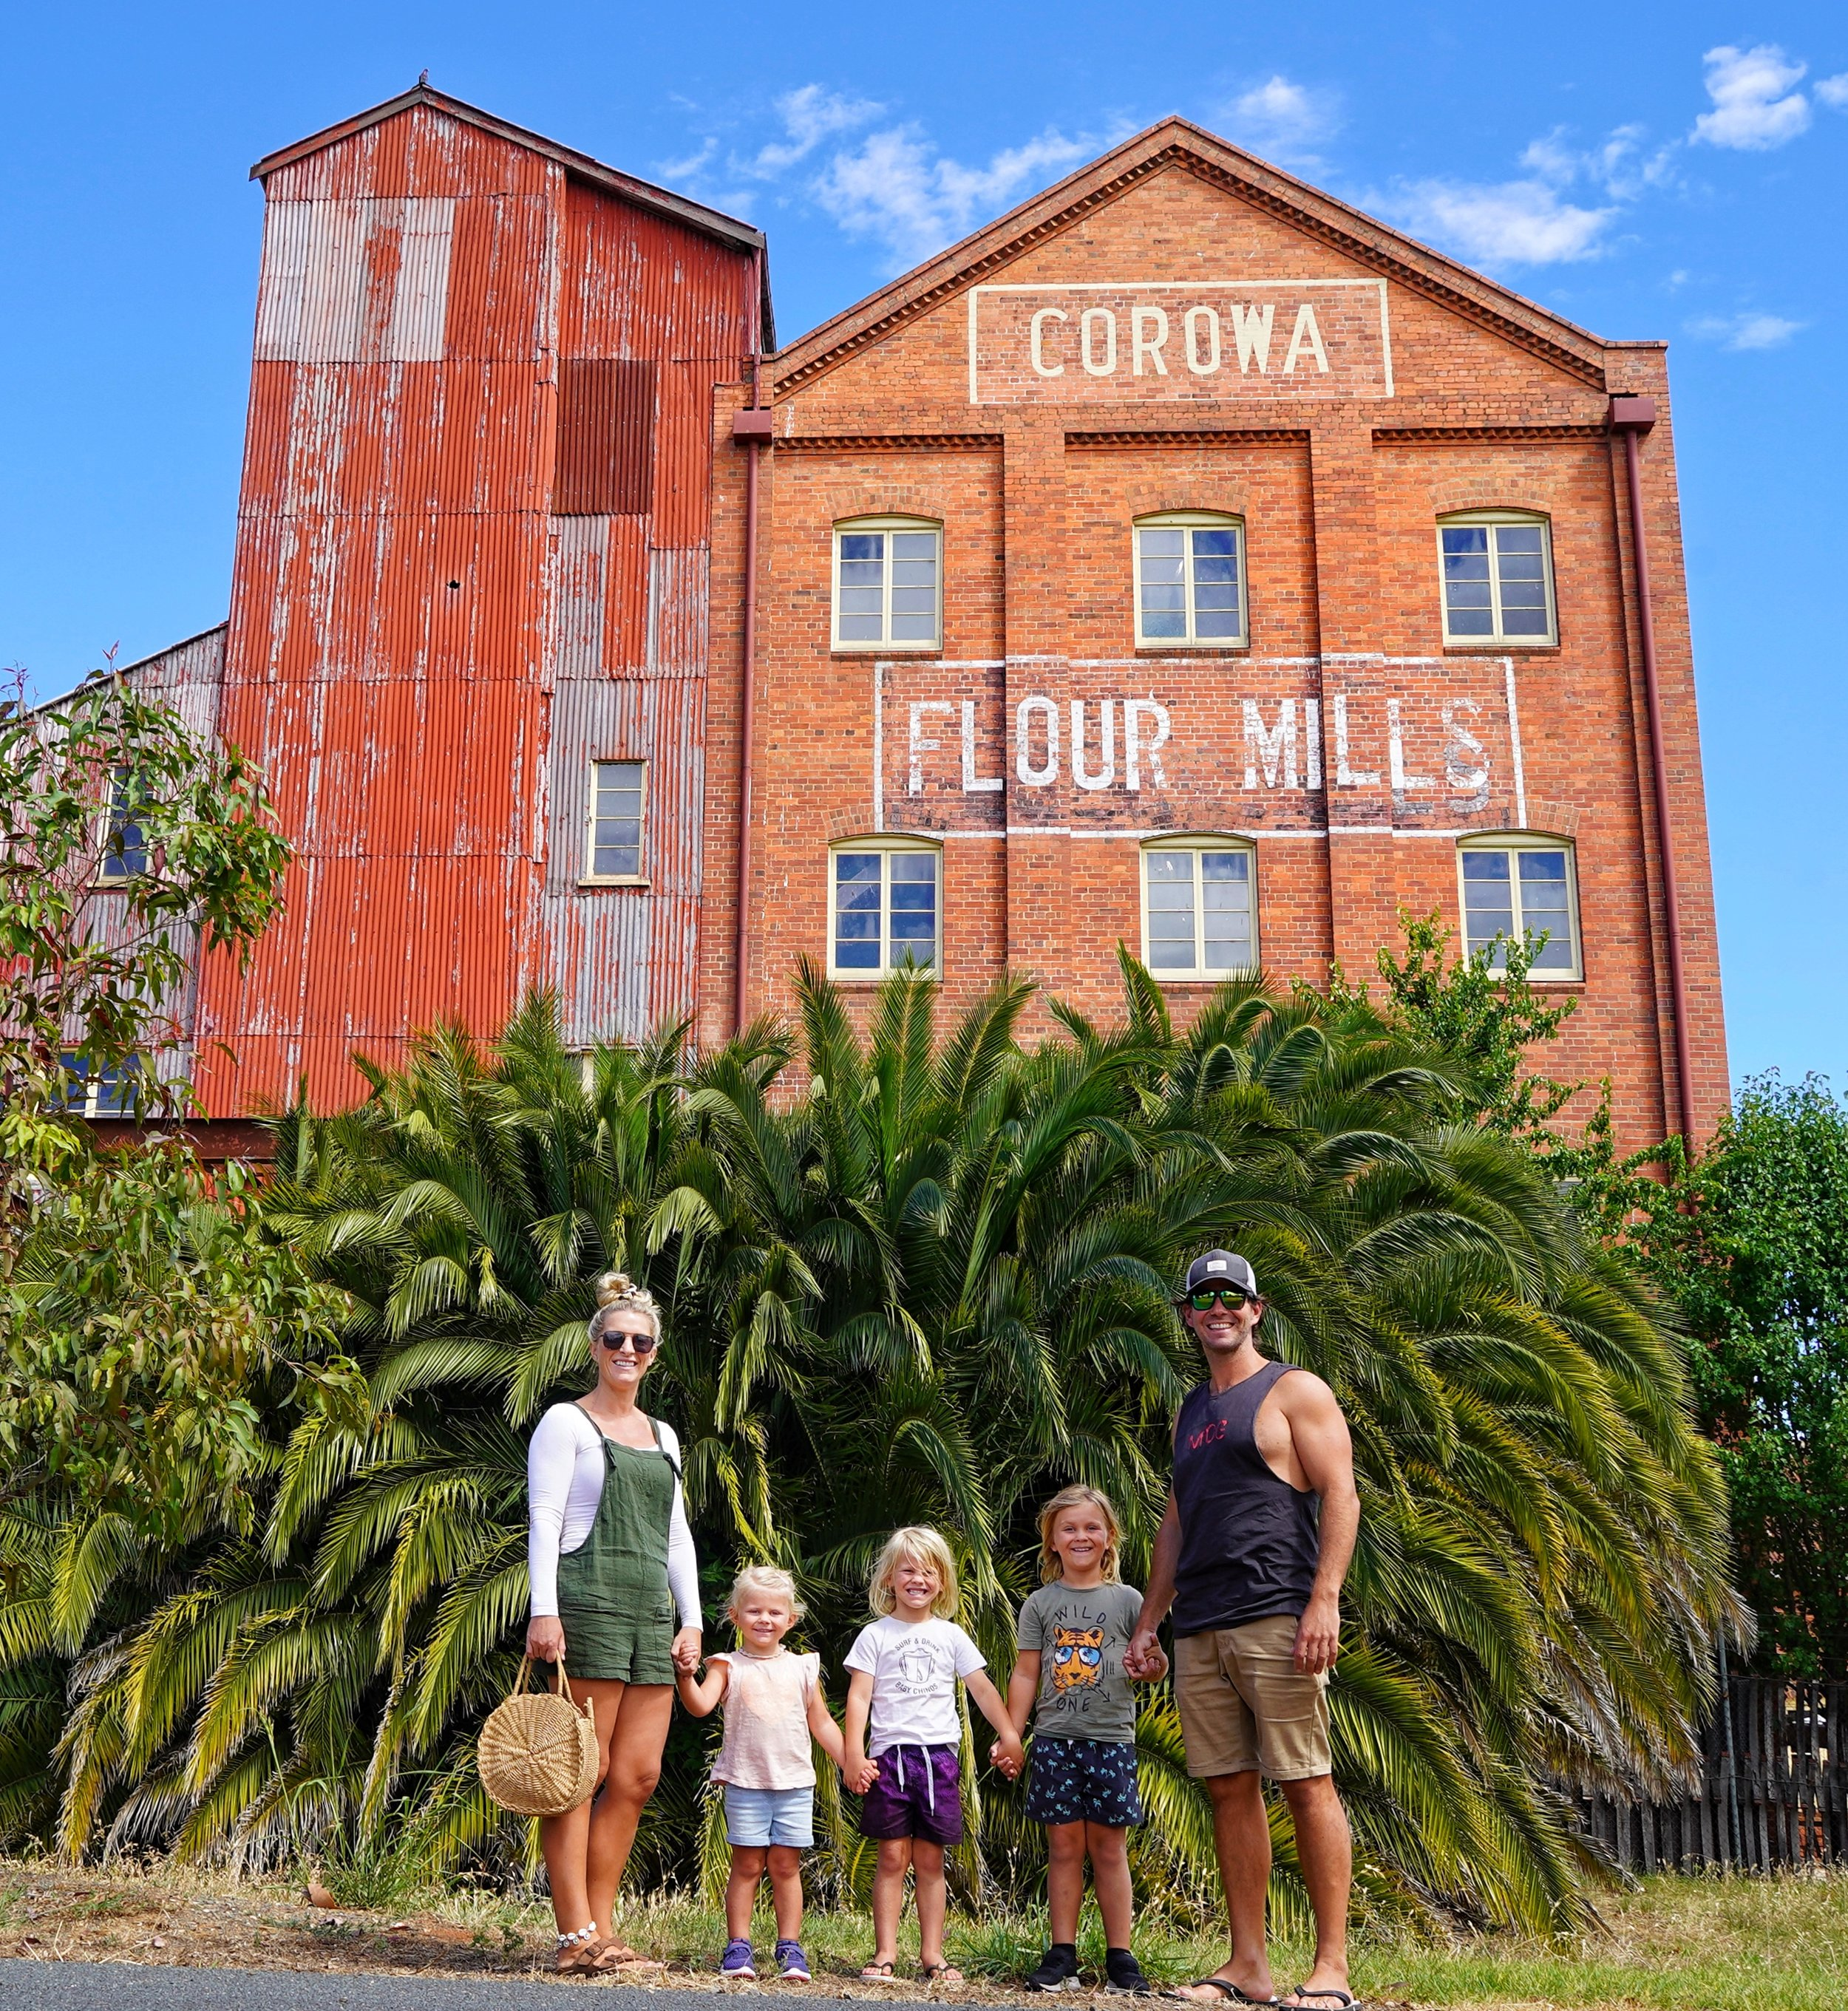 Corowa Whisky & Chocolate Factory (an old flour mill)